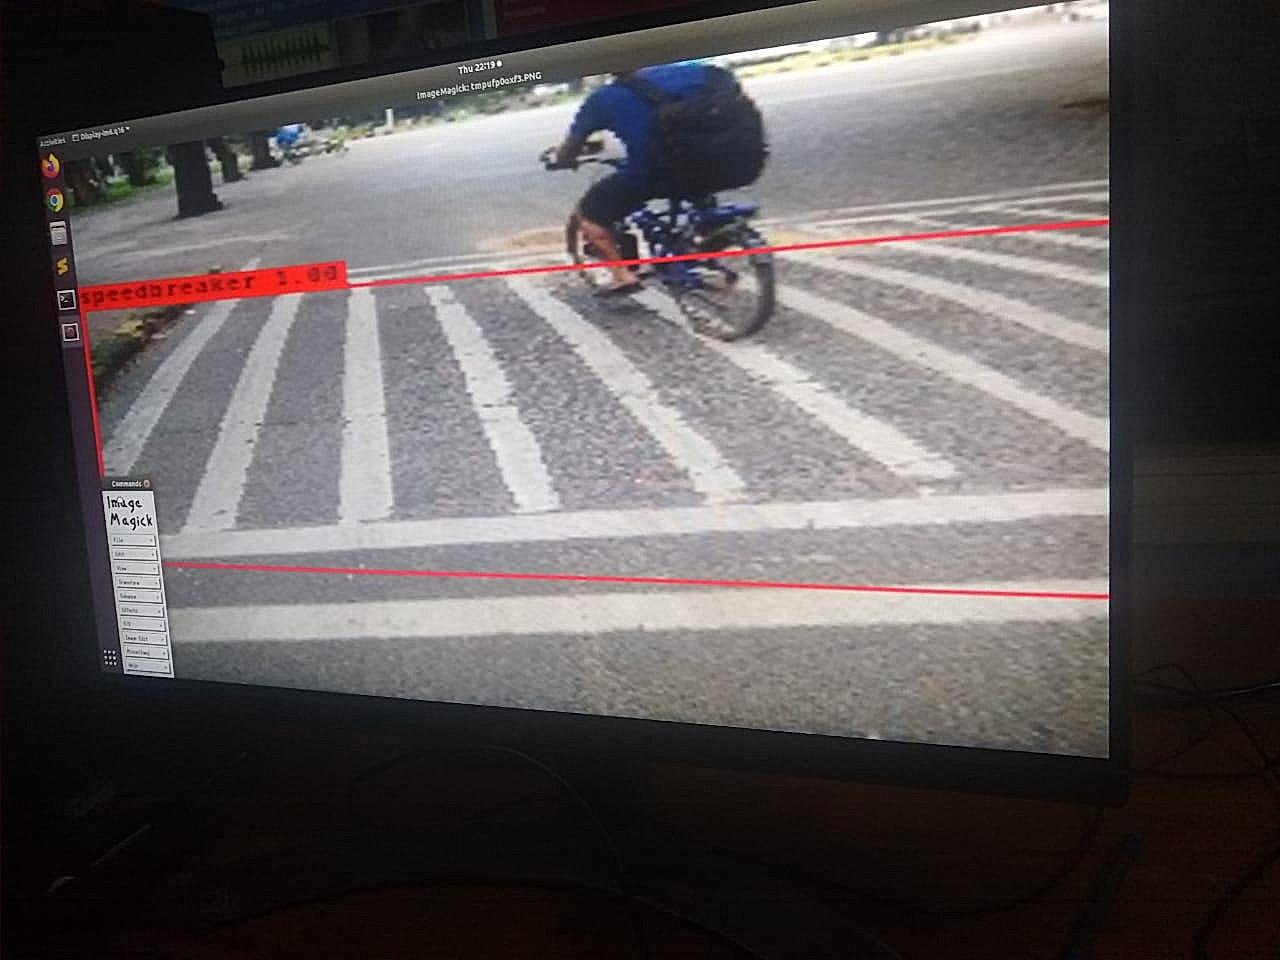 Instance Segmentation - Zebra Crossing